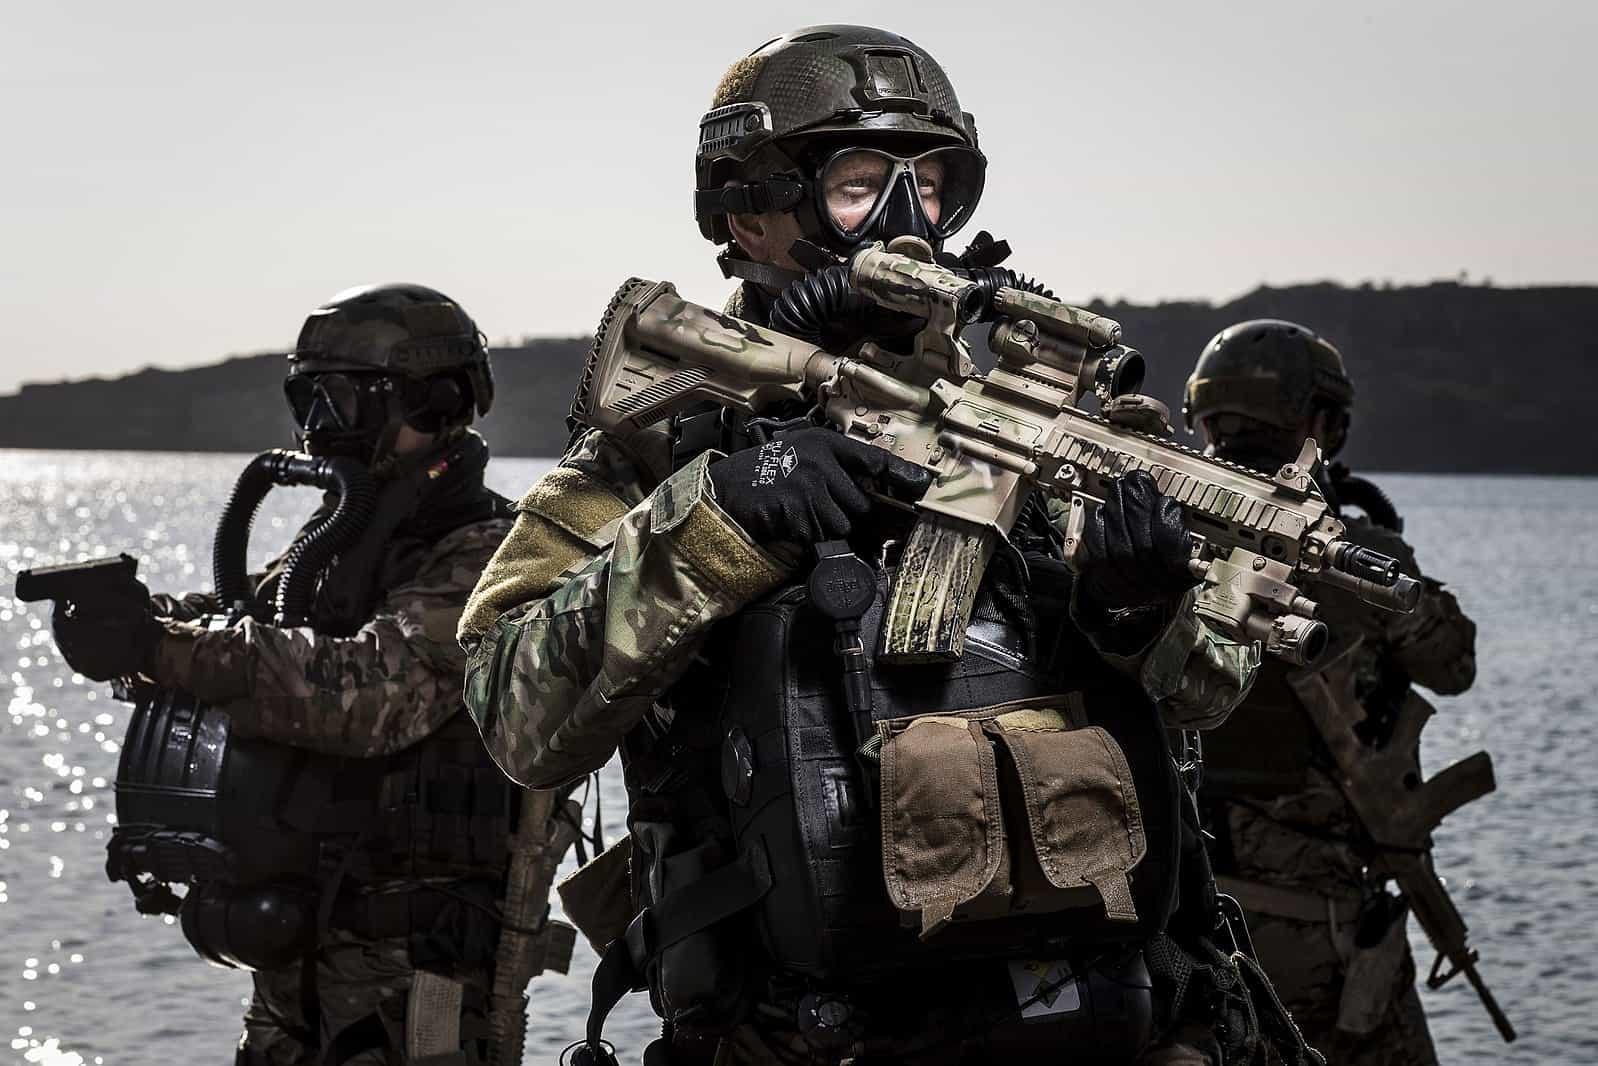 1599px-A_diver_of_the_Dutch_Korps_Commandotroepen_with_a_HK416_D10RS